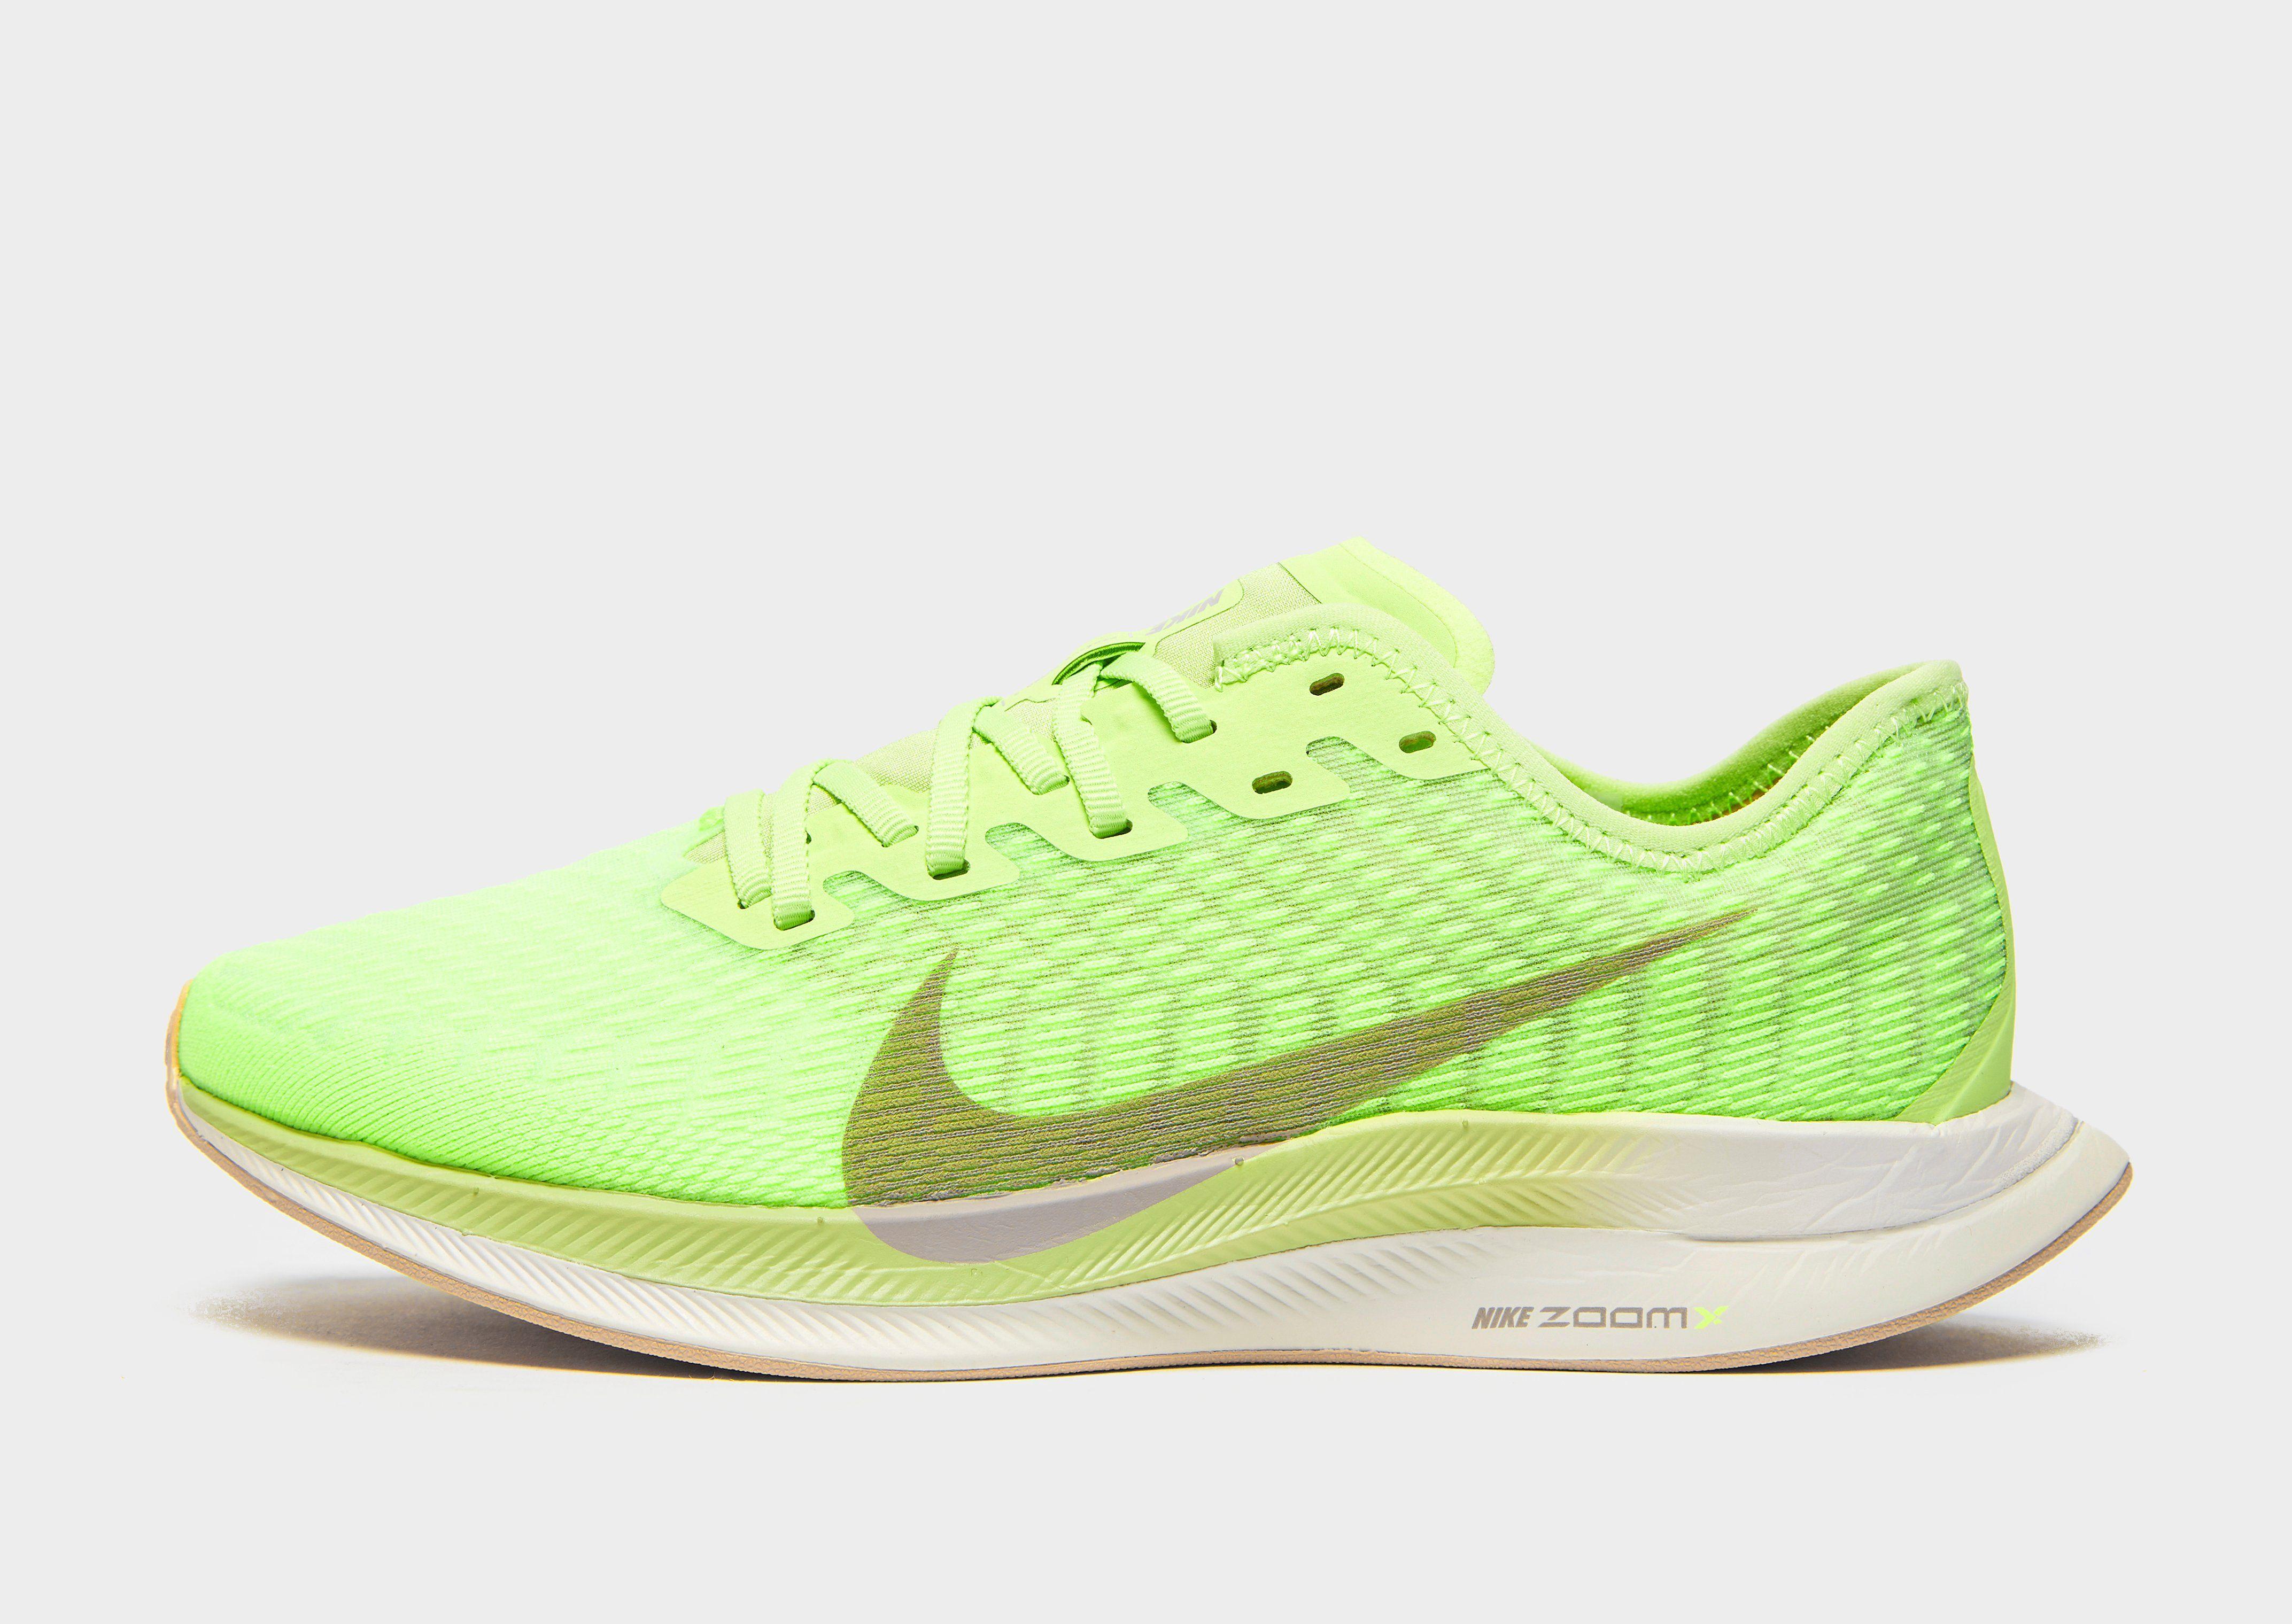 innovative design 9cdd9 653ca Nike Zoom Pegasus Turbo 2 Women's | JD Sports Ireland